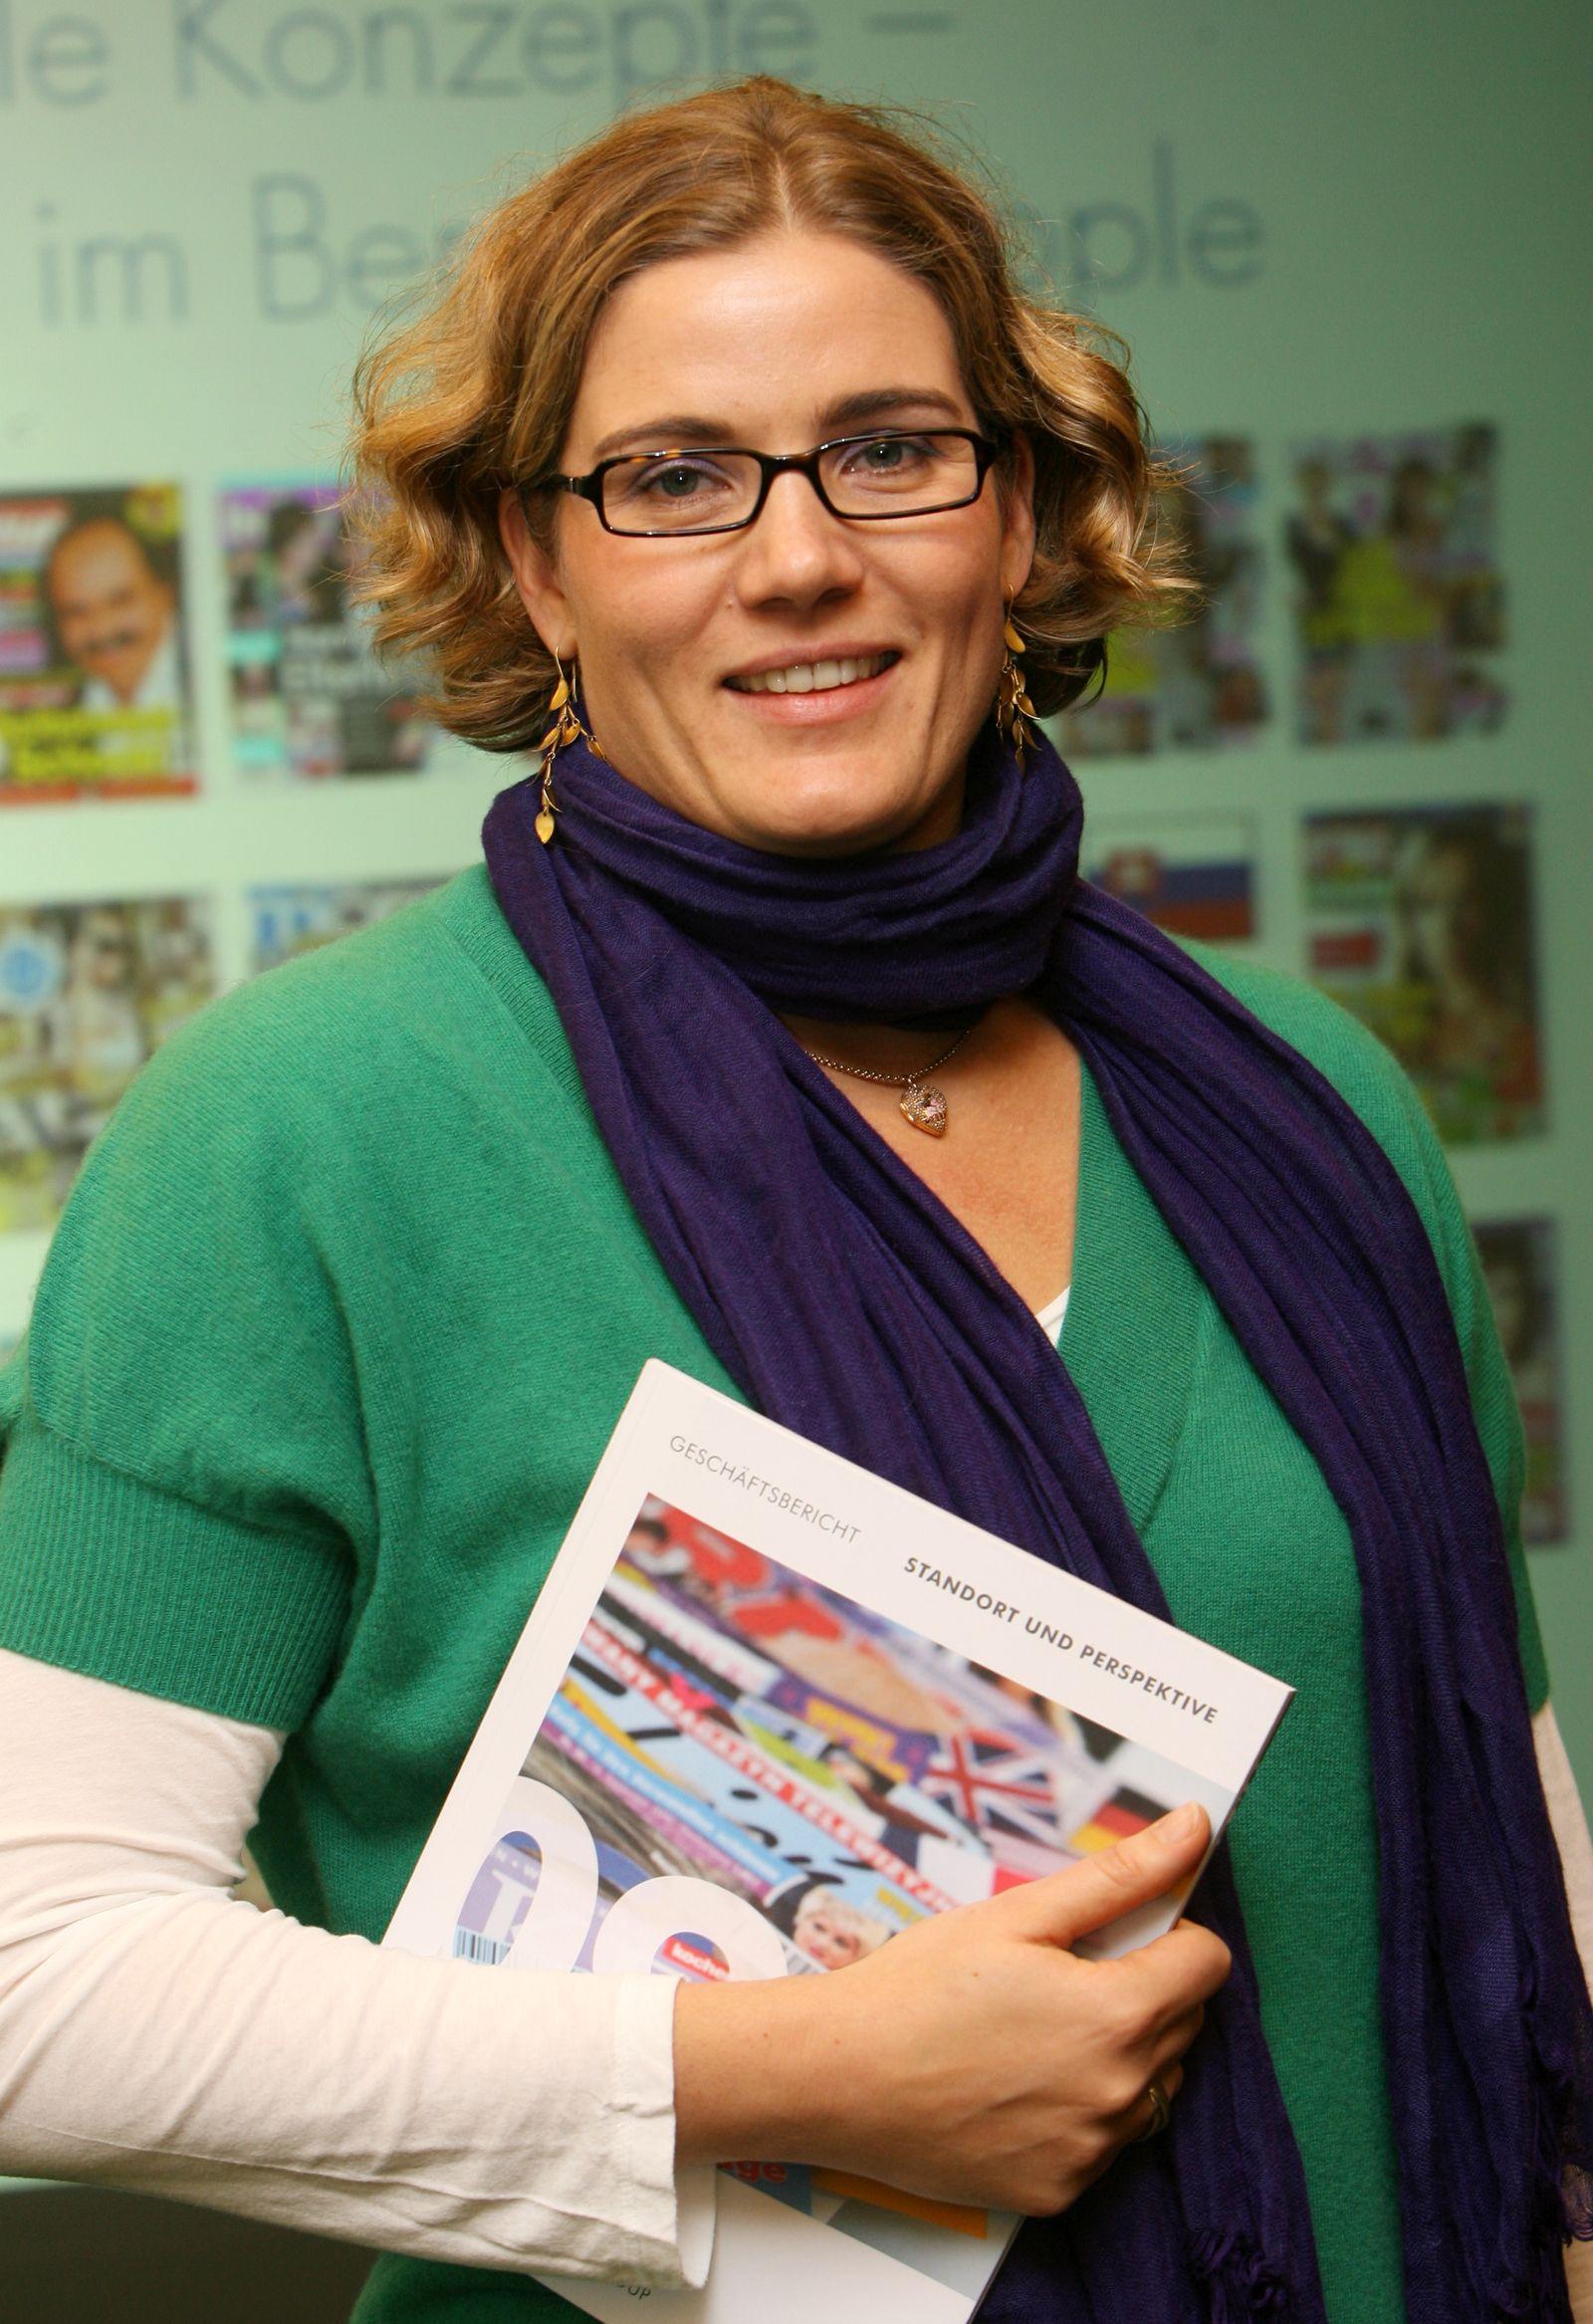 Yvonne Bauer / Bauer Media Group